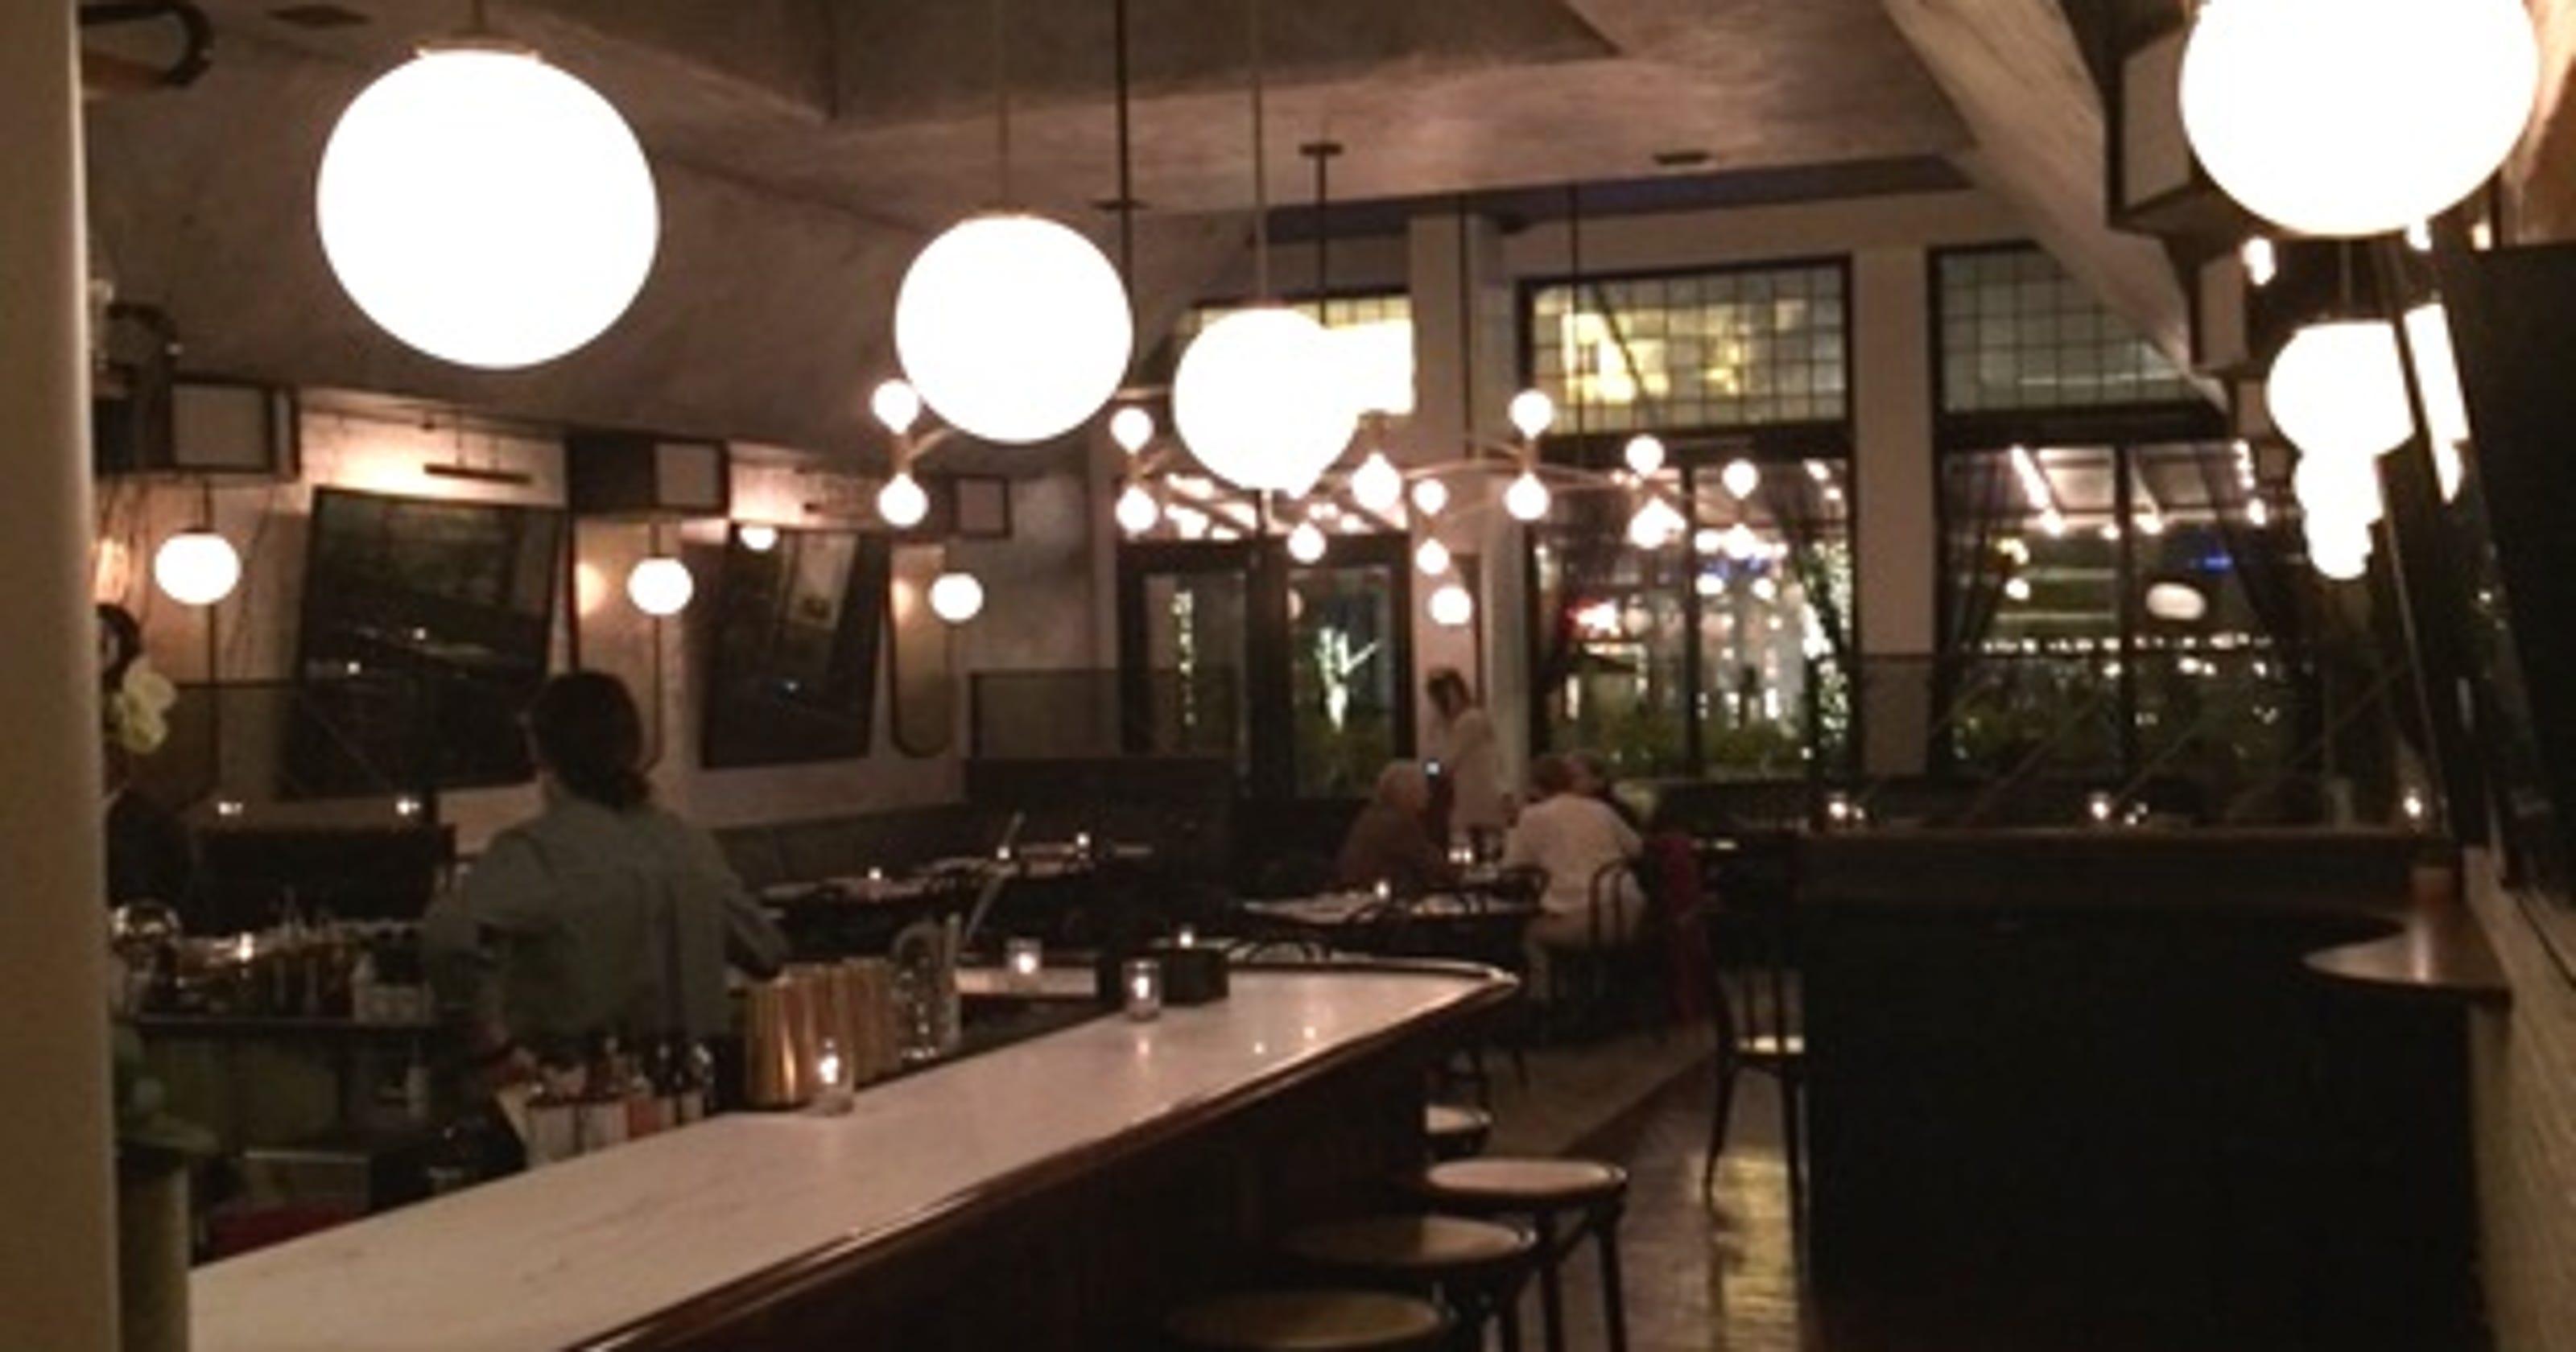 5 Star Restaurants In Knoxville Tn | Best Restaurants Near Me